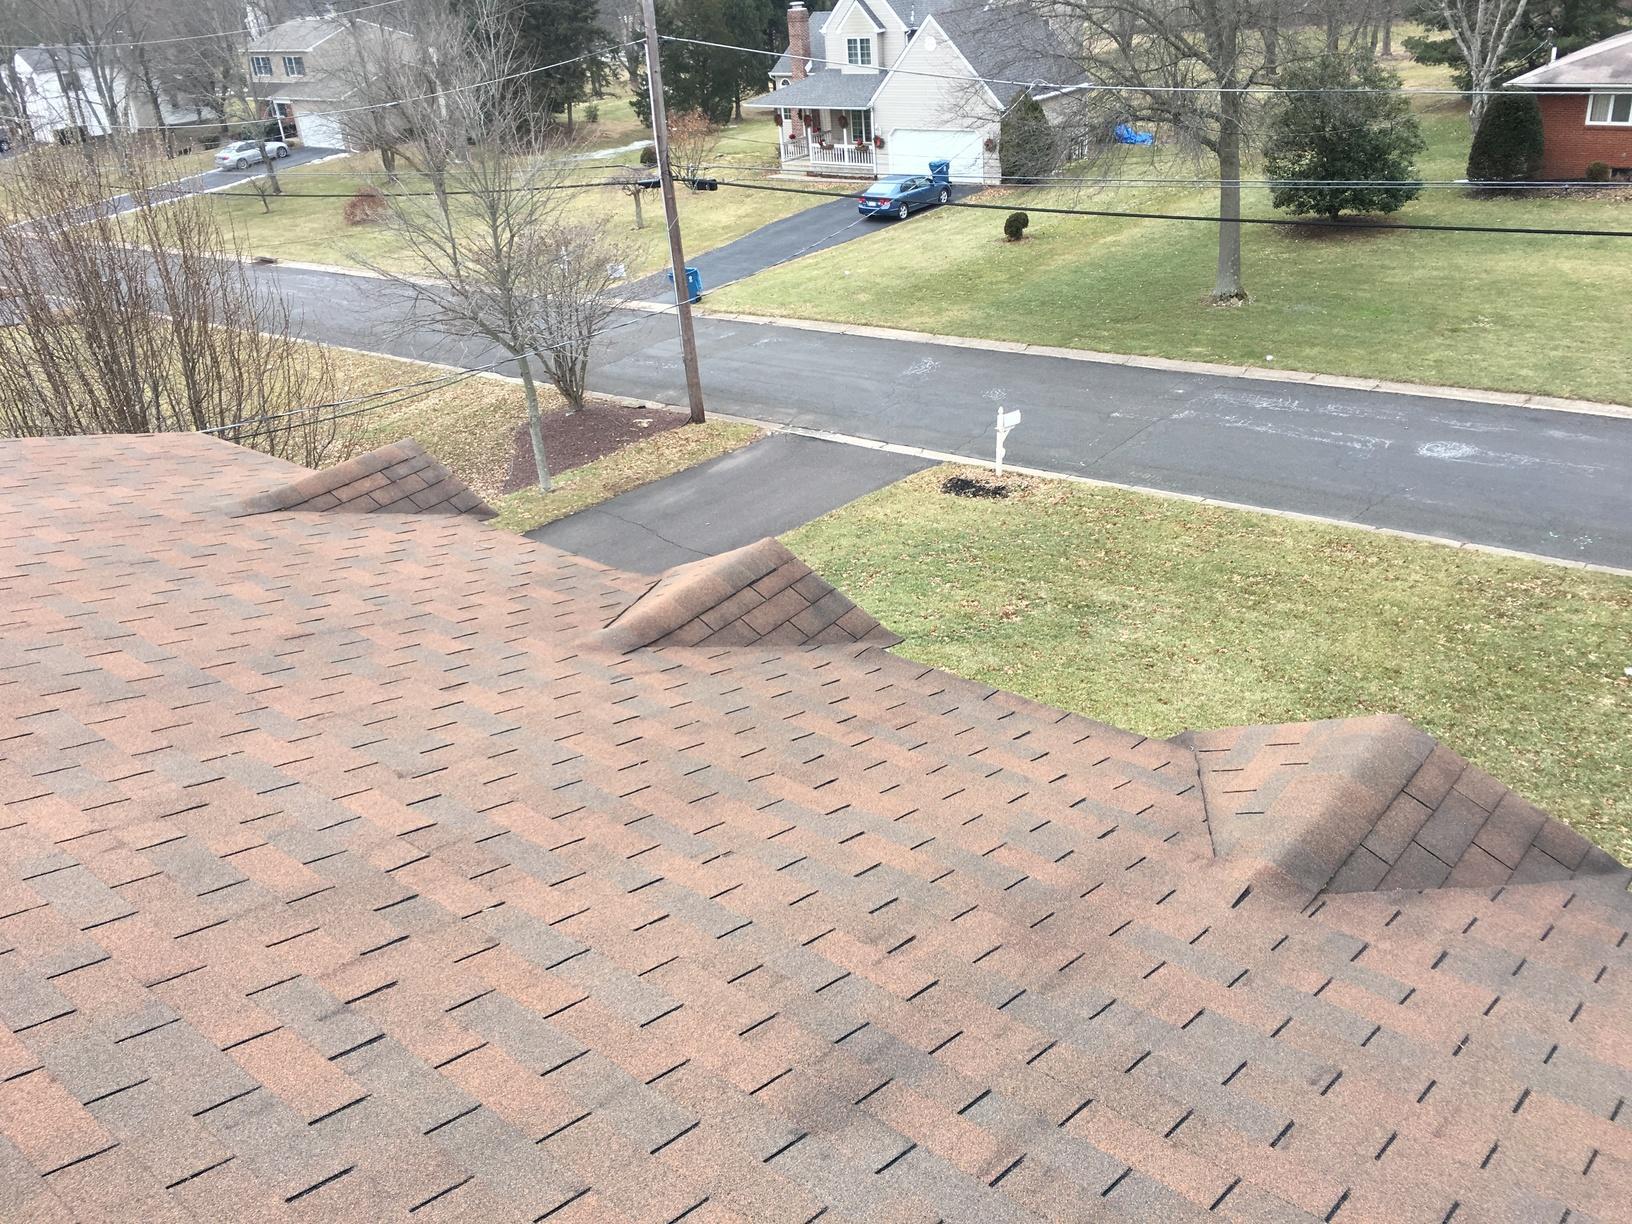 Replacing Asphalt Shingles in Doylestown, PA